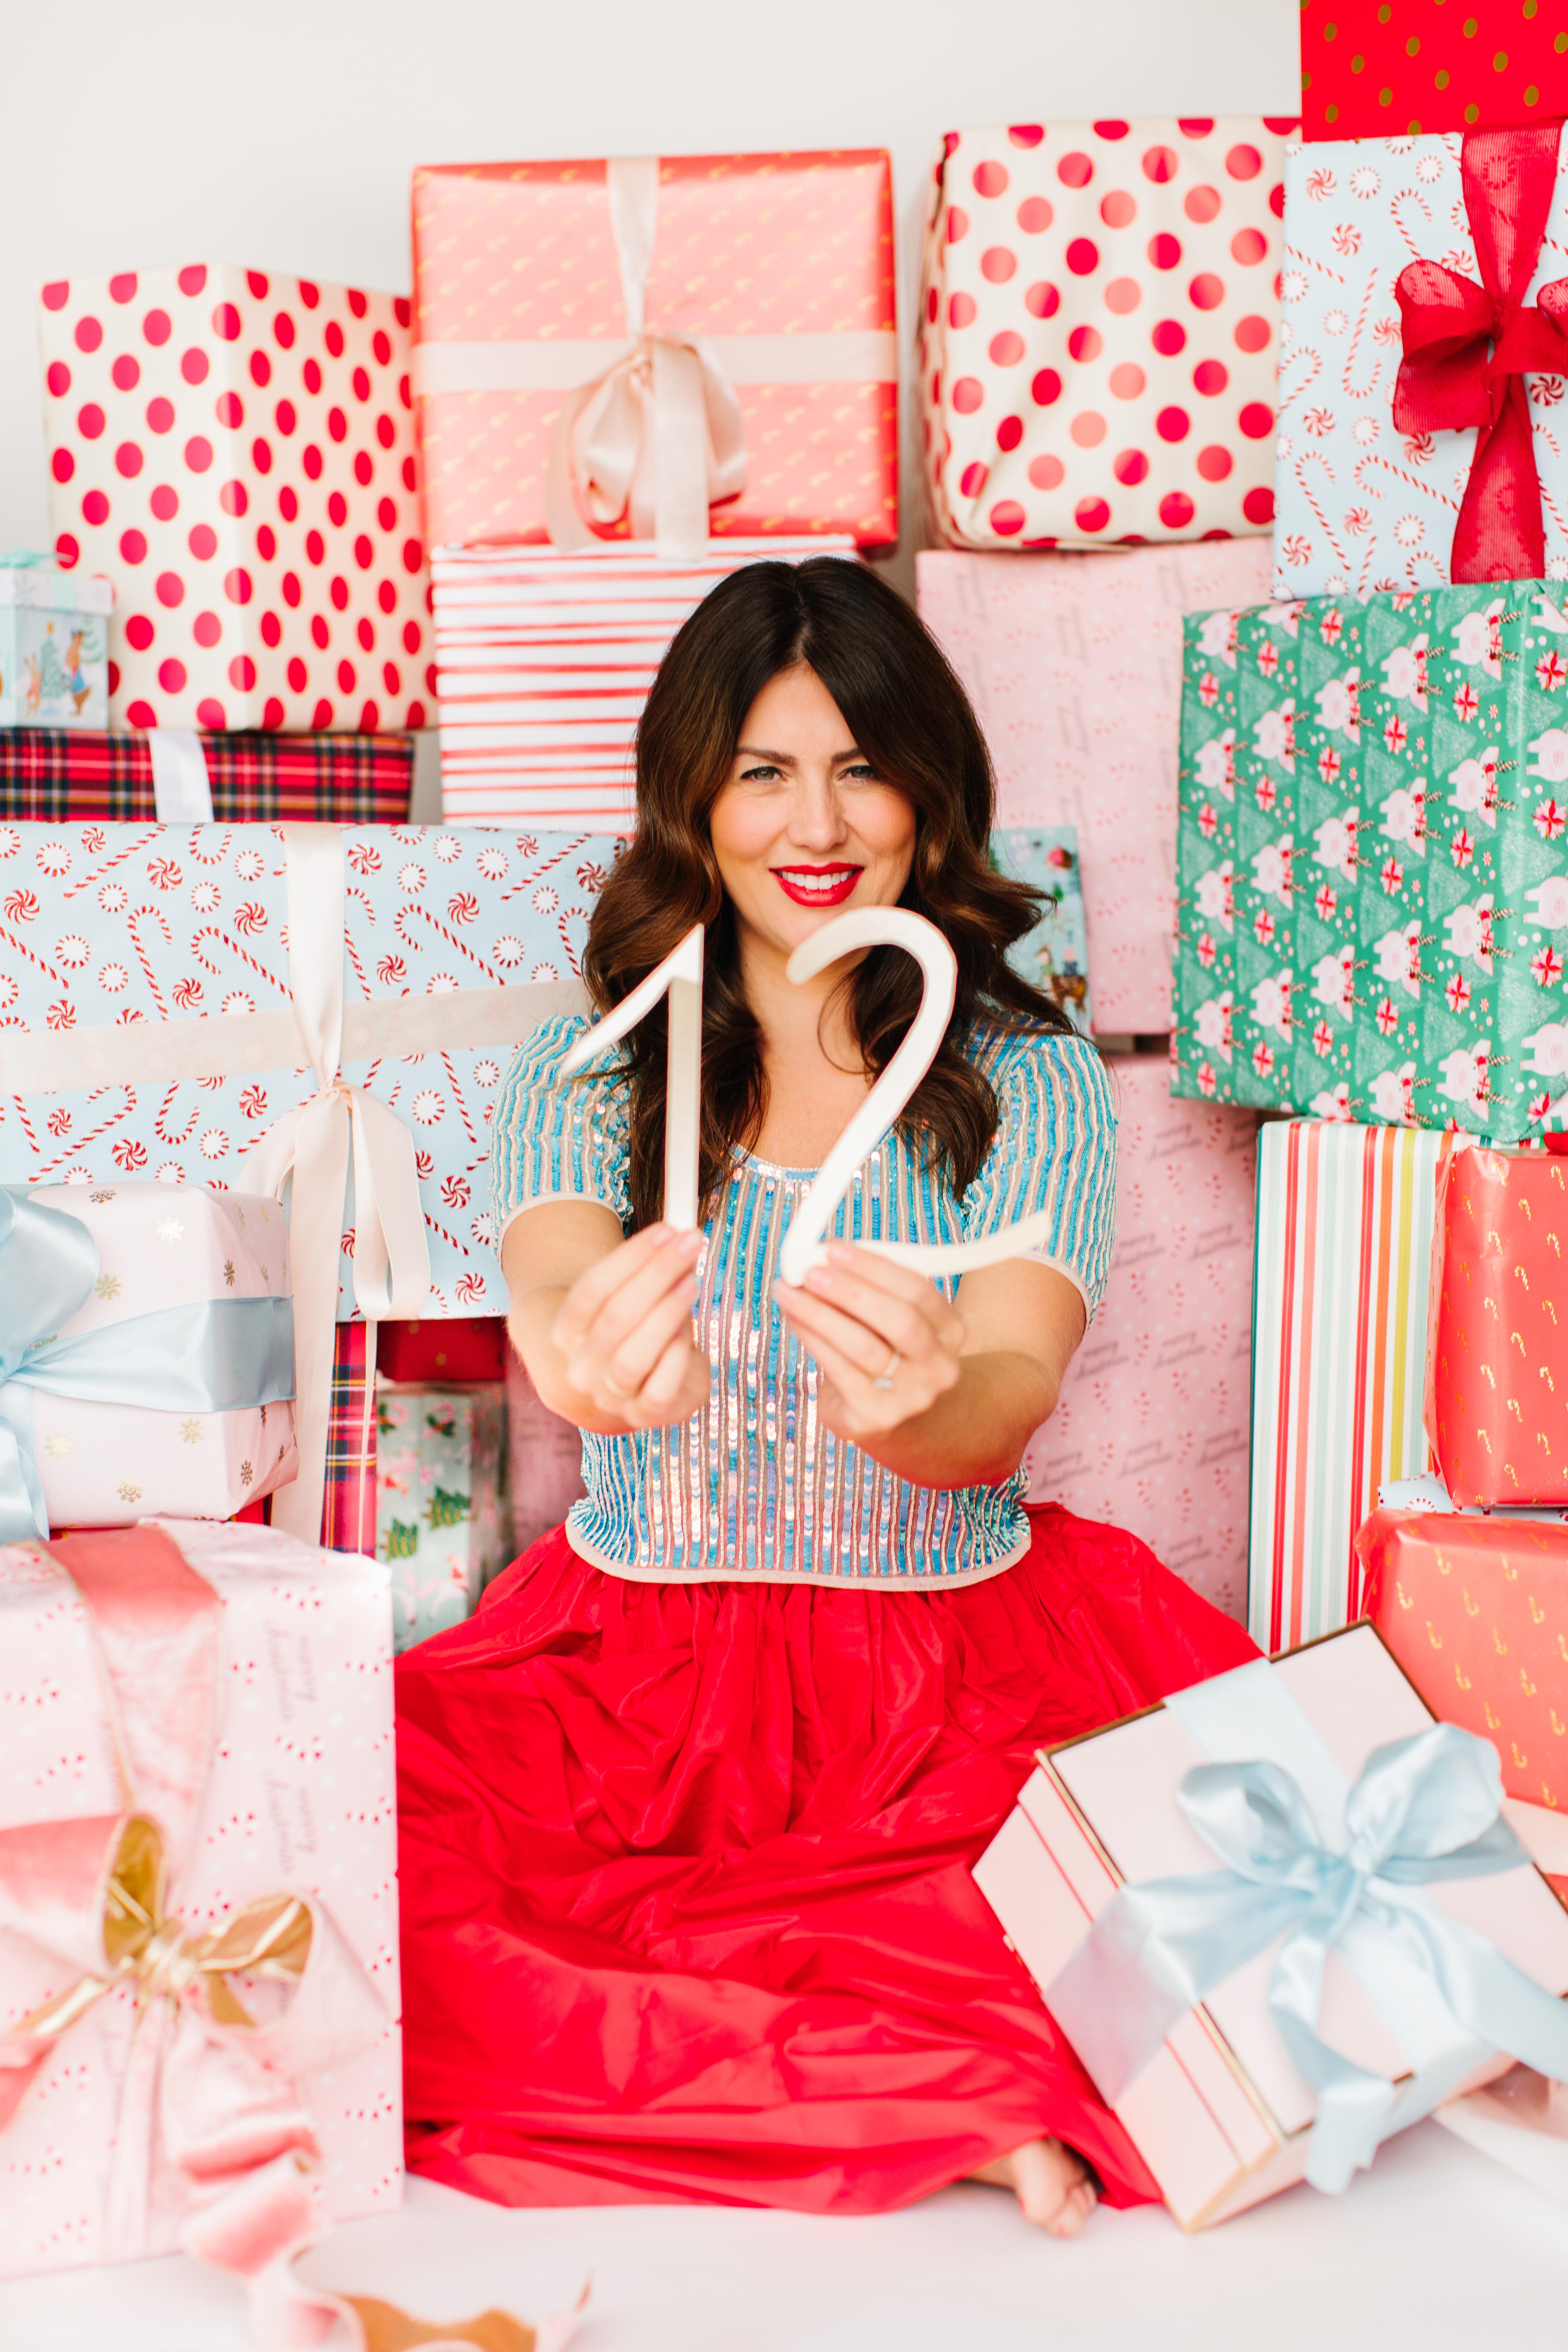 Jillian Harris 12 Days of Giveaways